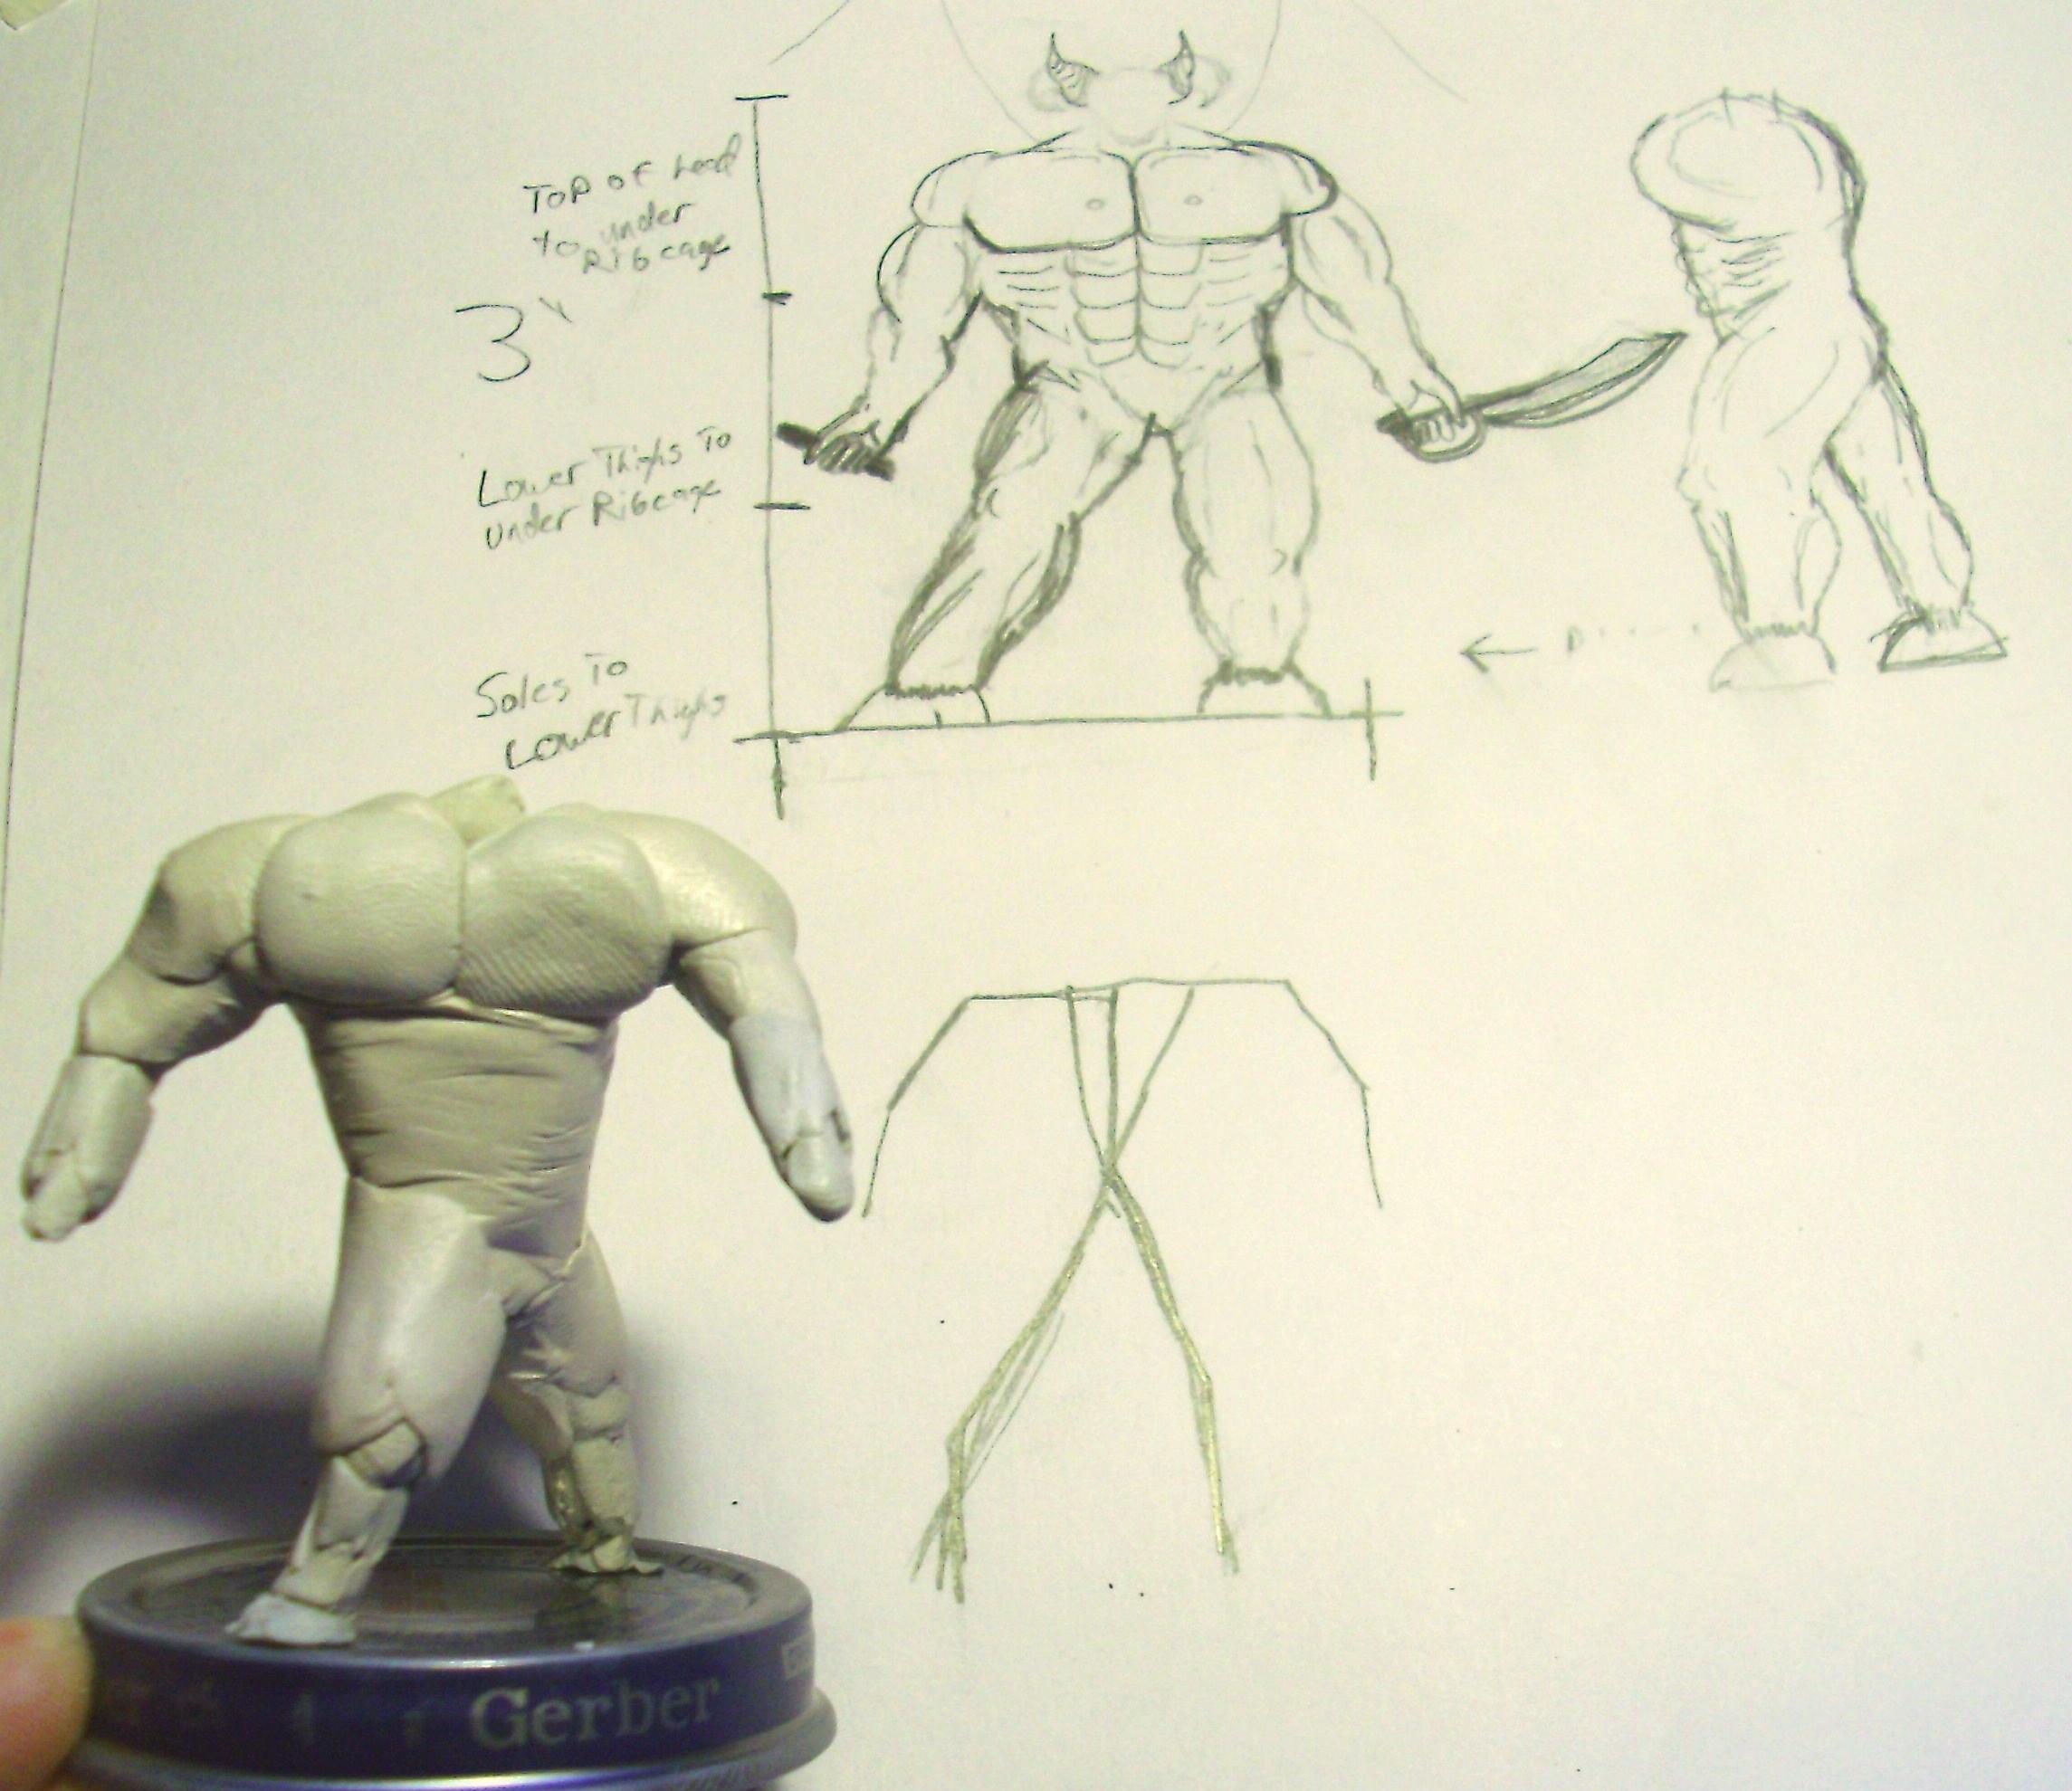 Armature compared to concept sketch